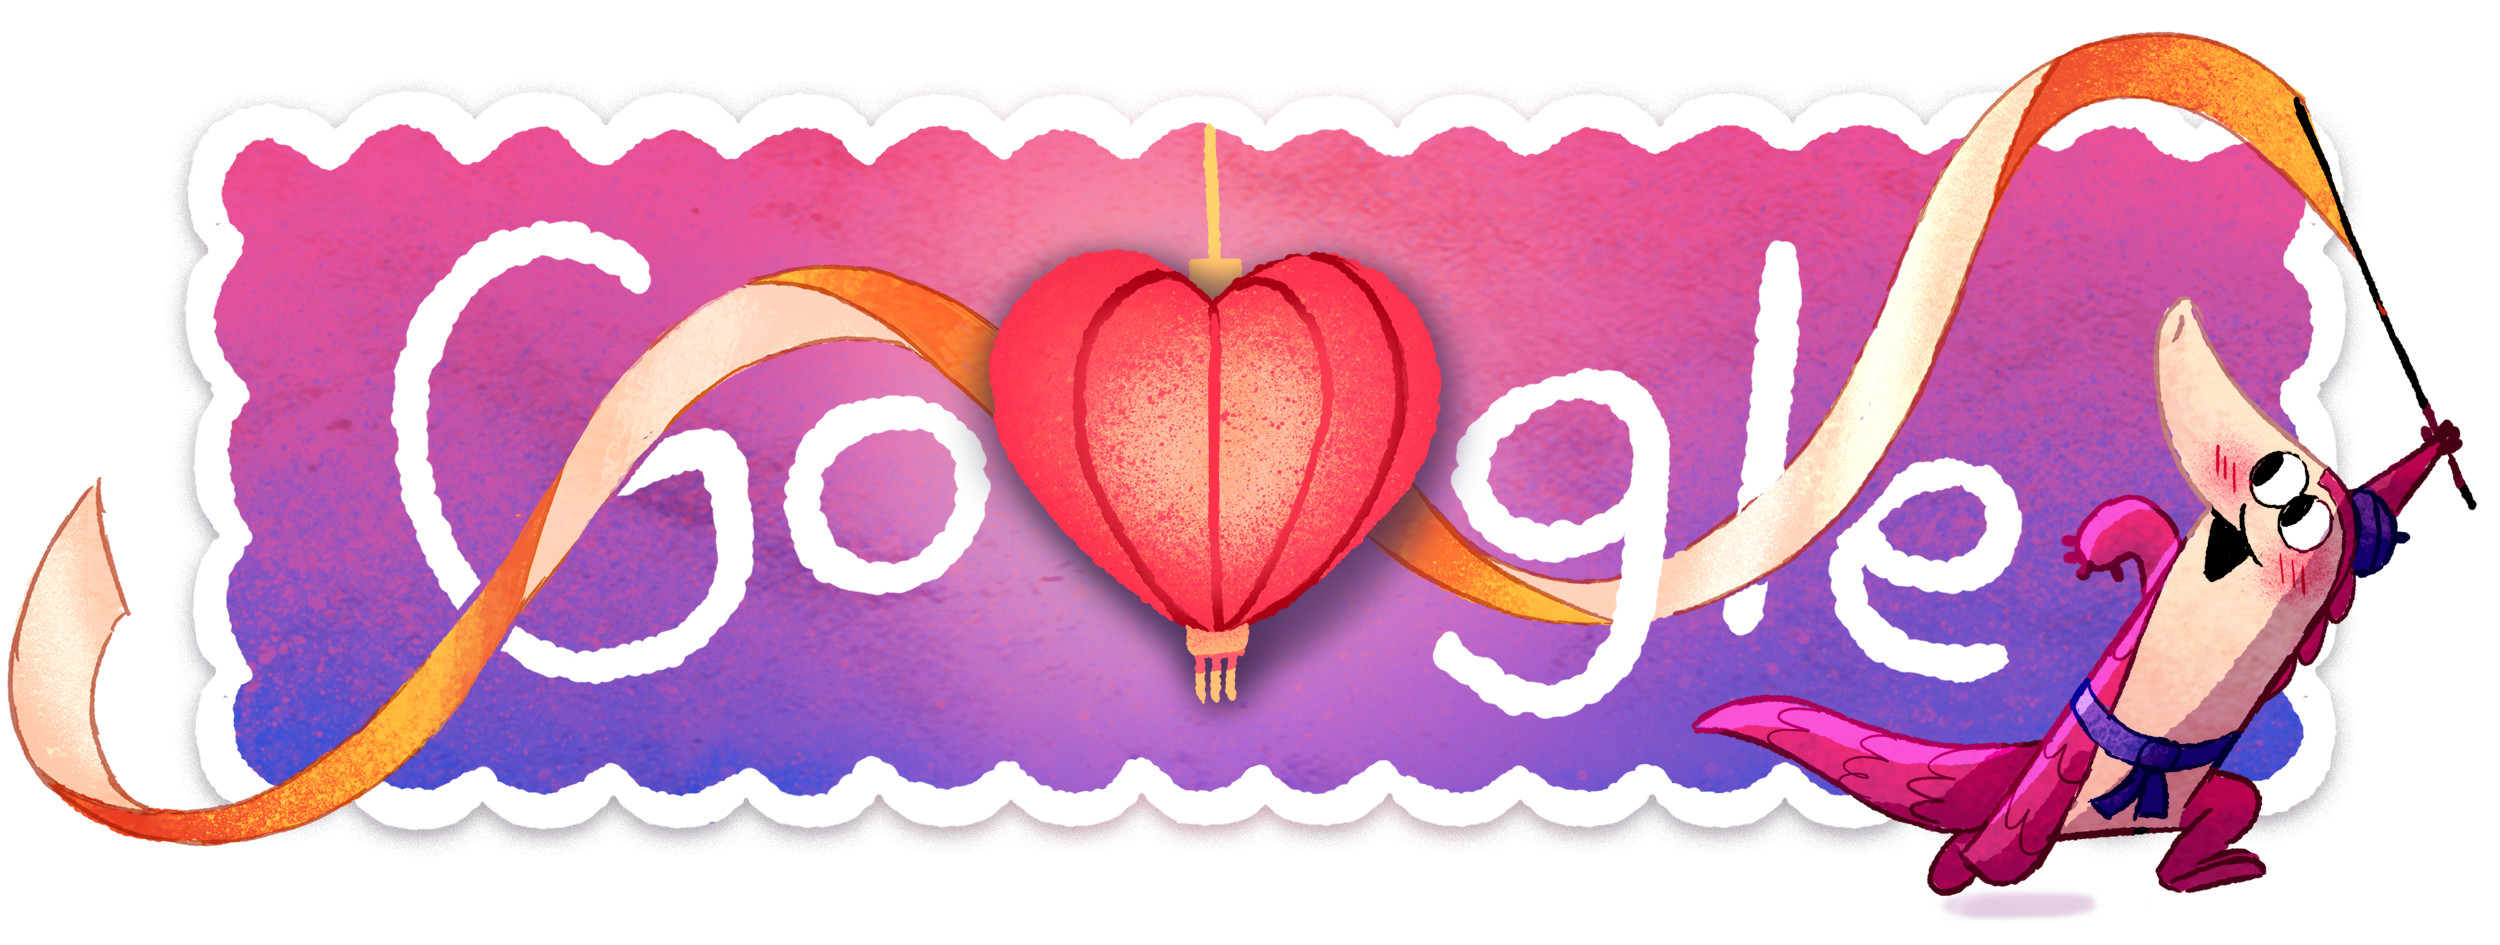 Valentines Day 2017 Day 3